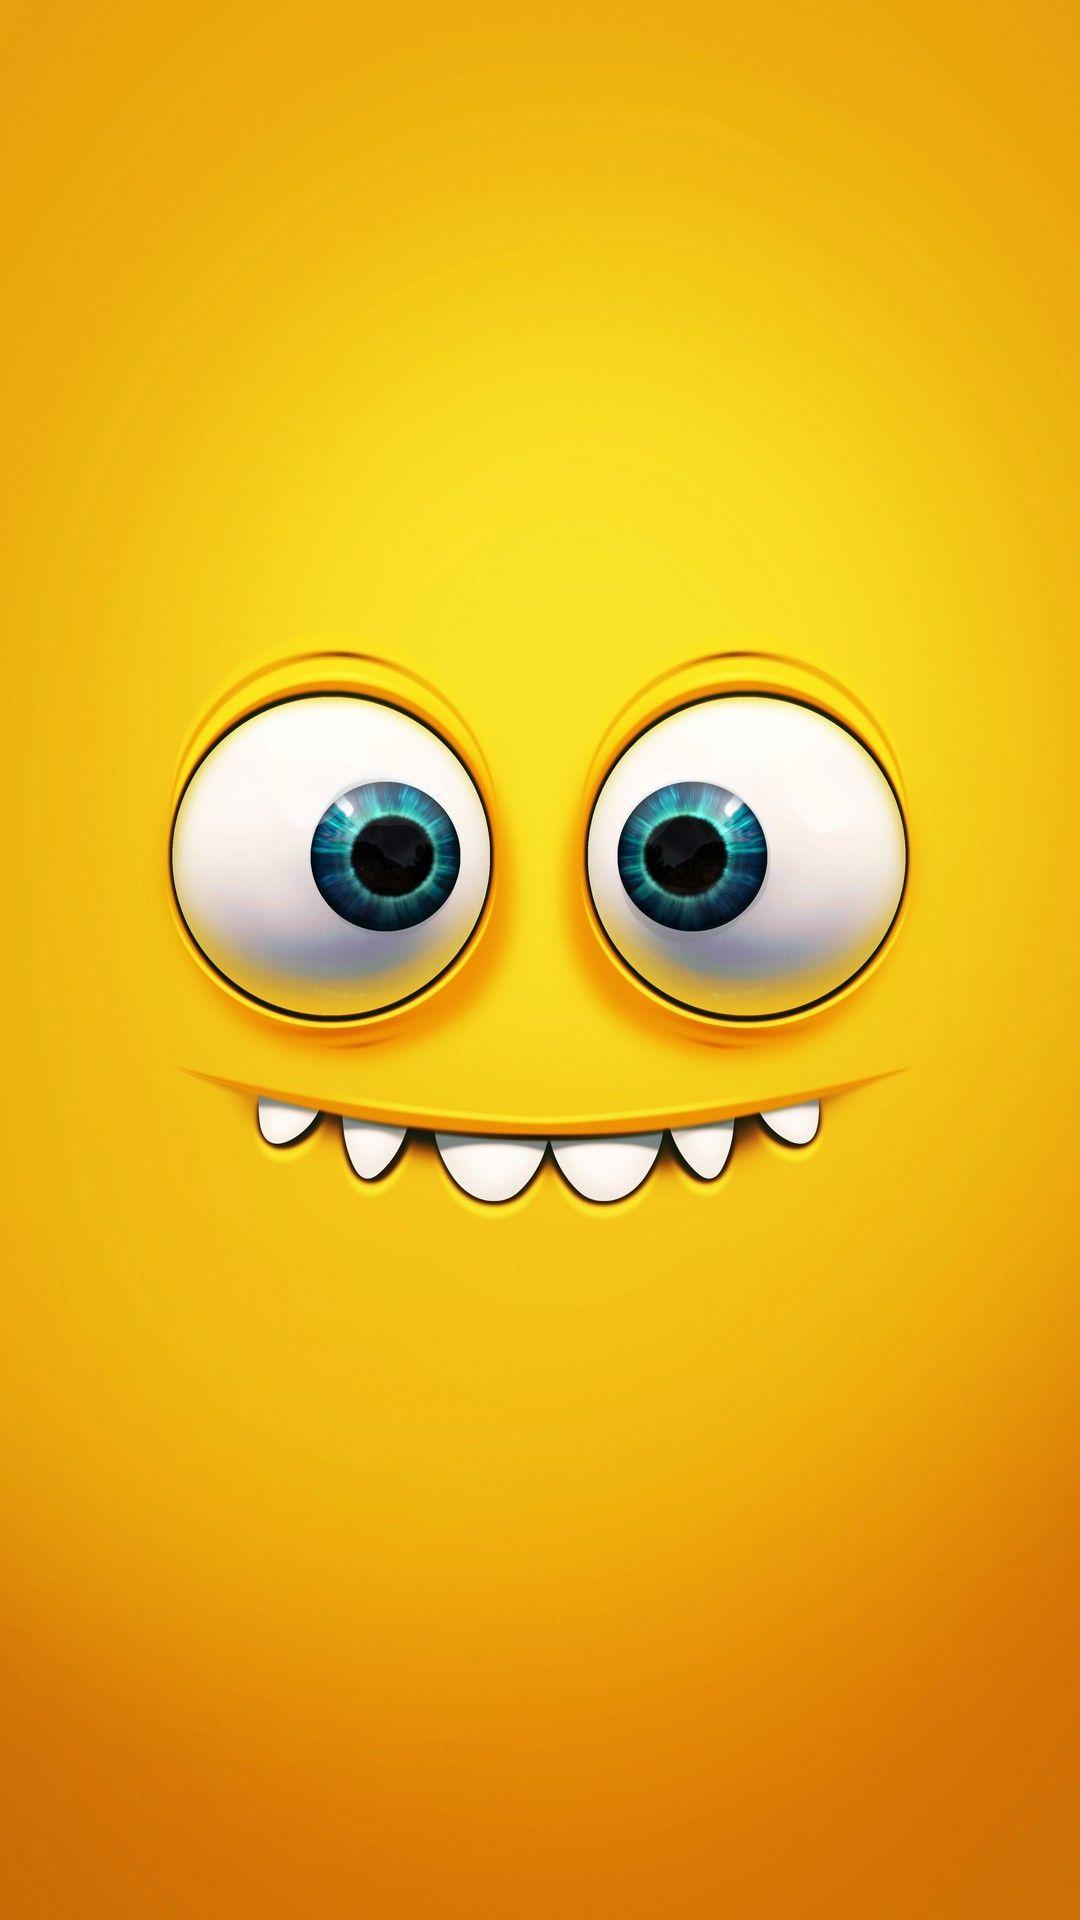 Smiling Face Hd Wallpaper Download Emoji Wallpaper Cartoon Wallpaper Crazy Wallpaper